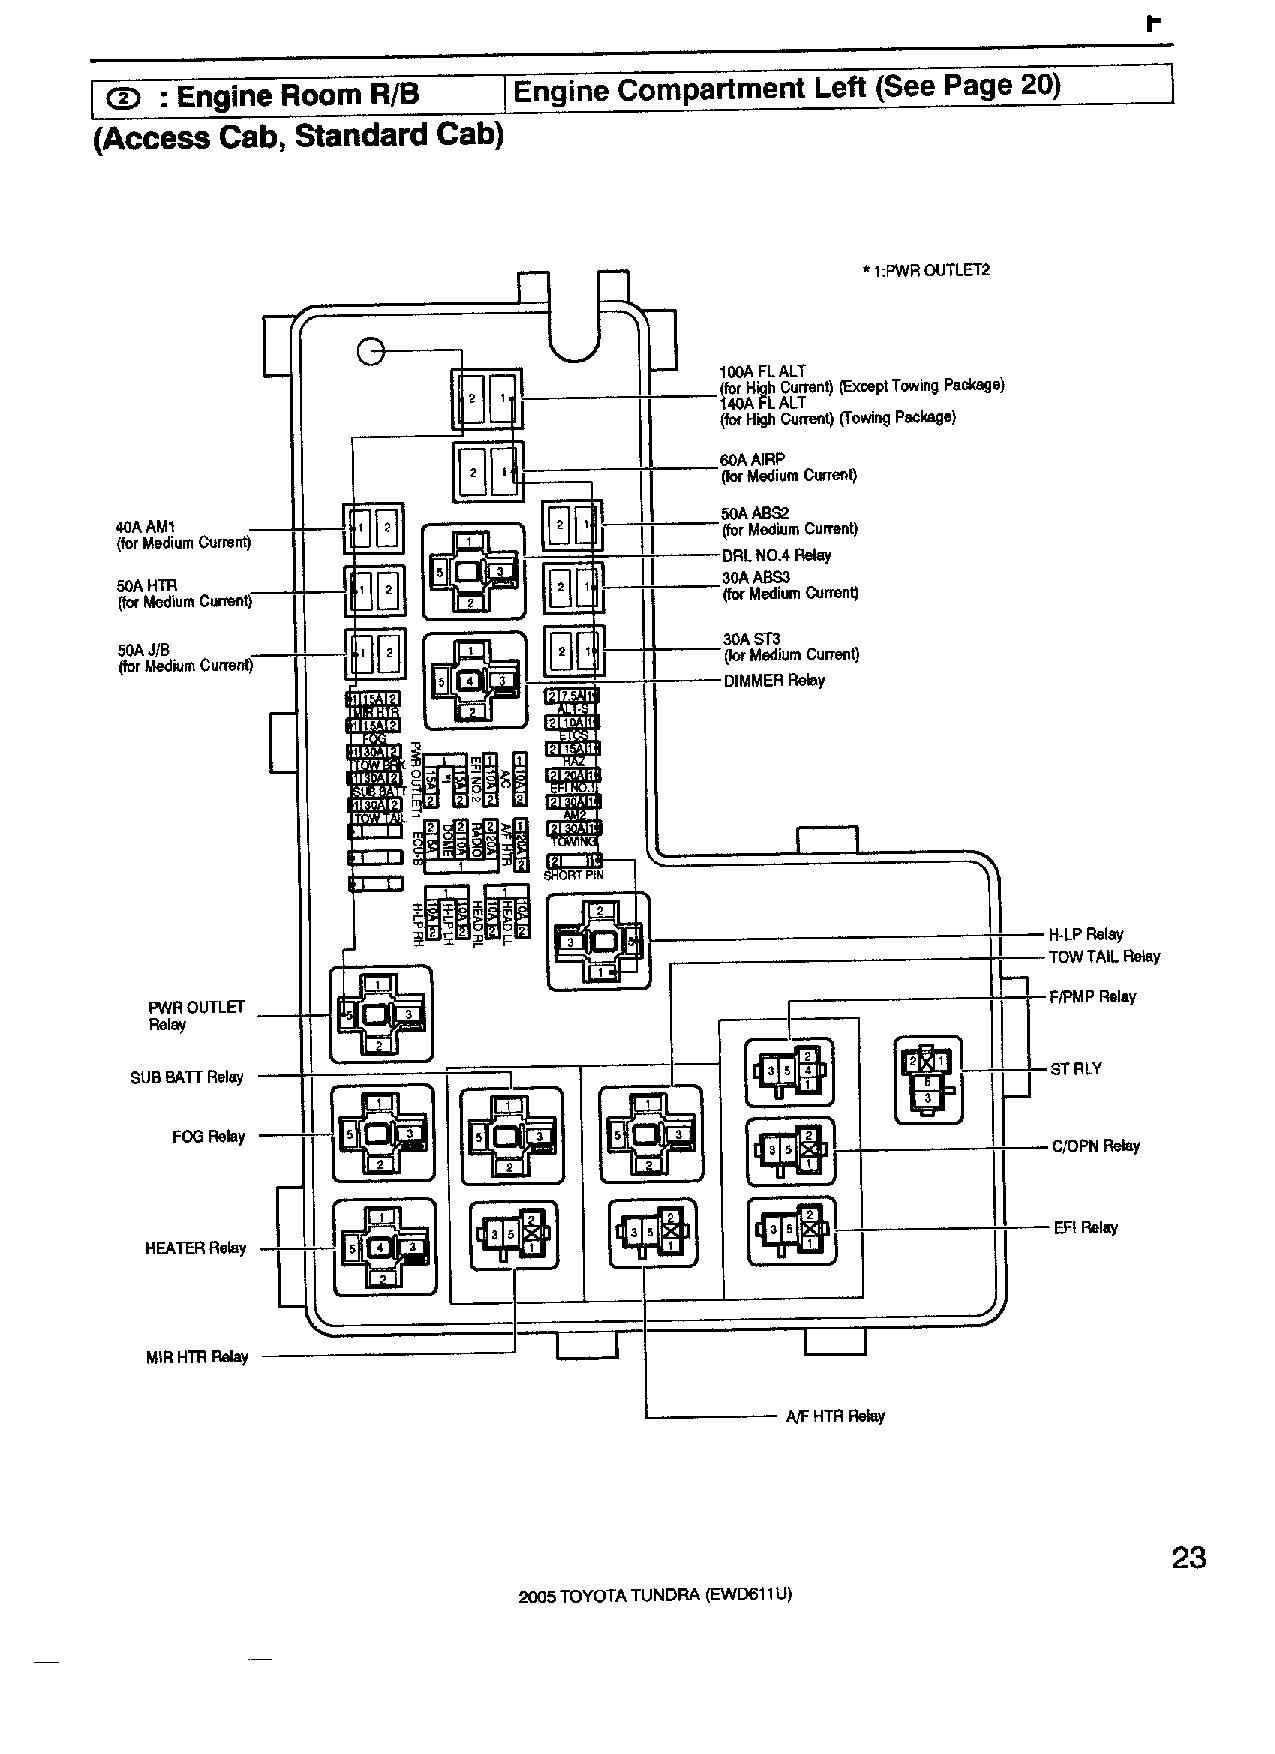 2000 toyota tundra fuel pump wiring diagram diagram base website wiring  diagram - loginsequencediagram.recht-dd.de  loginsequencediagram.recht-dd.de